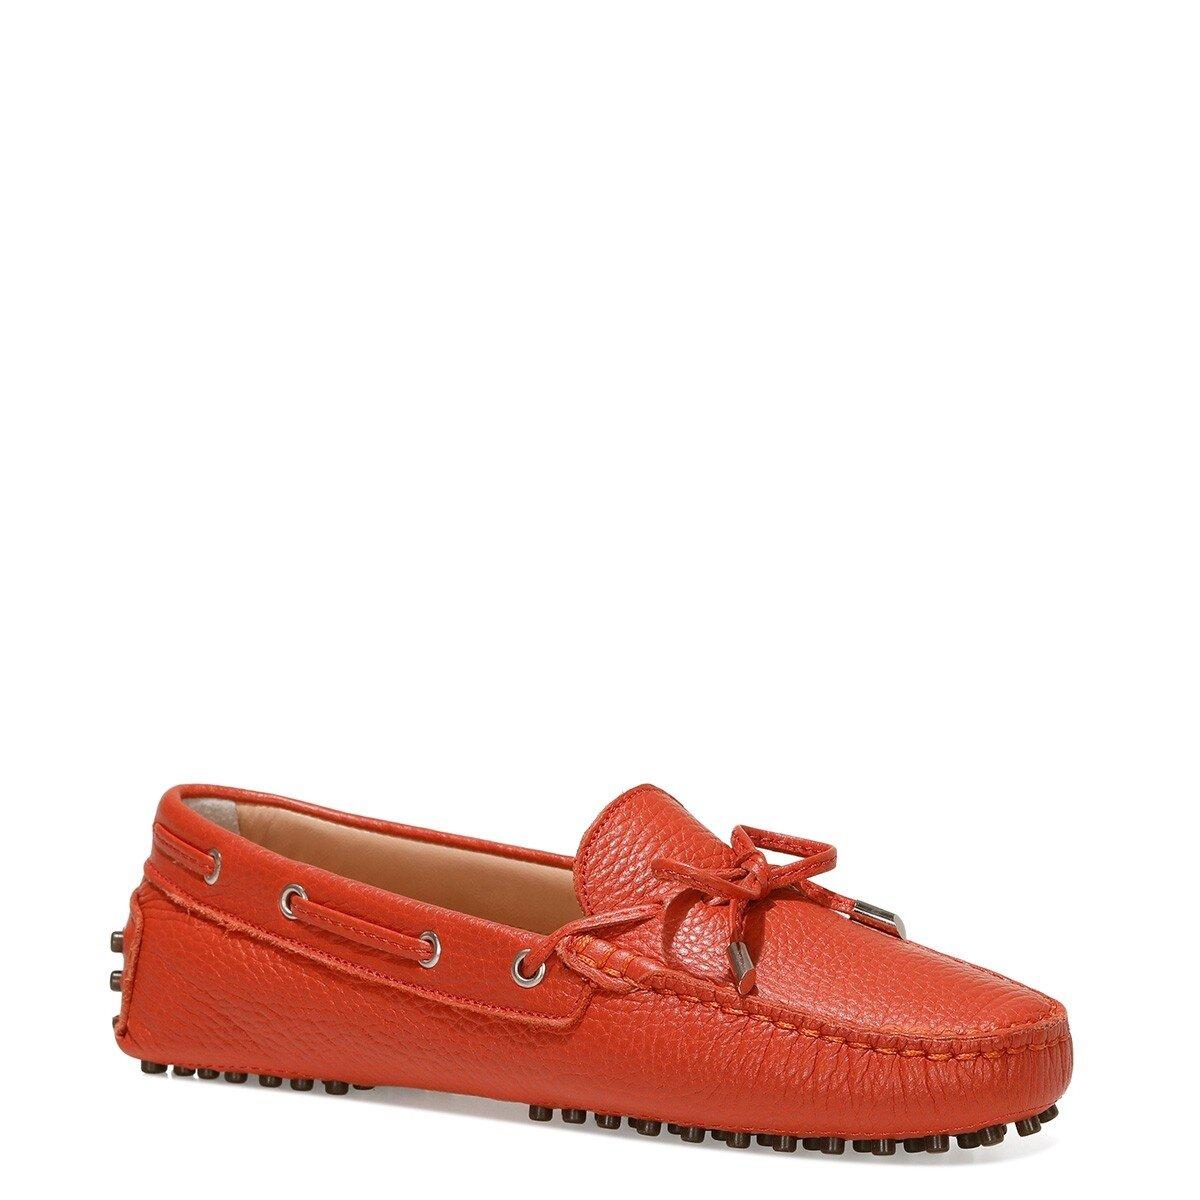 HOLT 1FX Mercan Kadın Loafer Ayakkabı